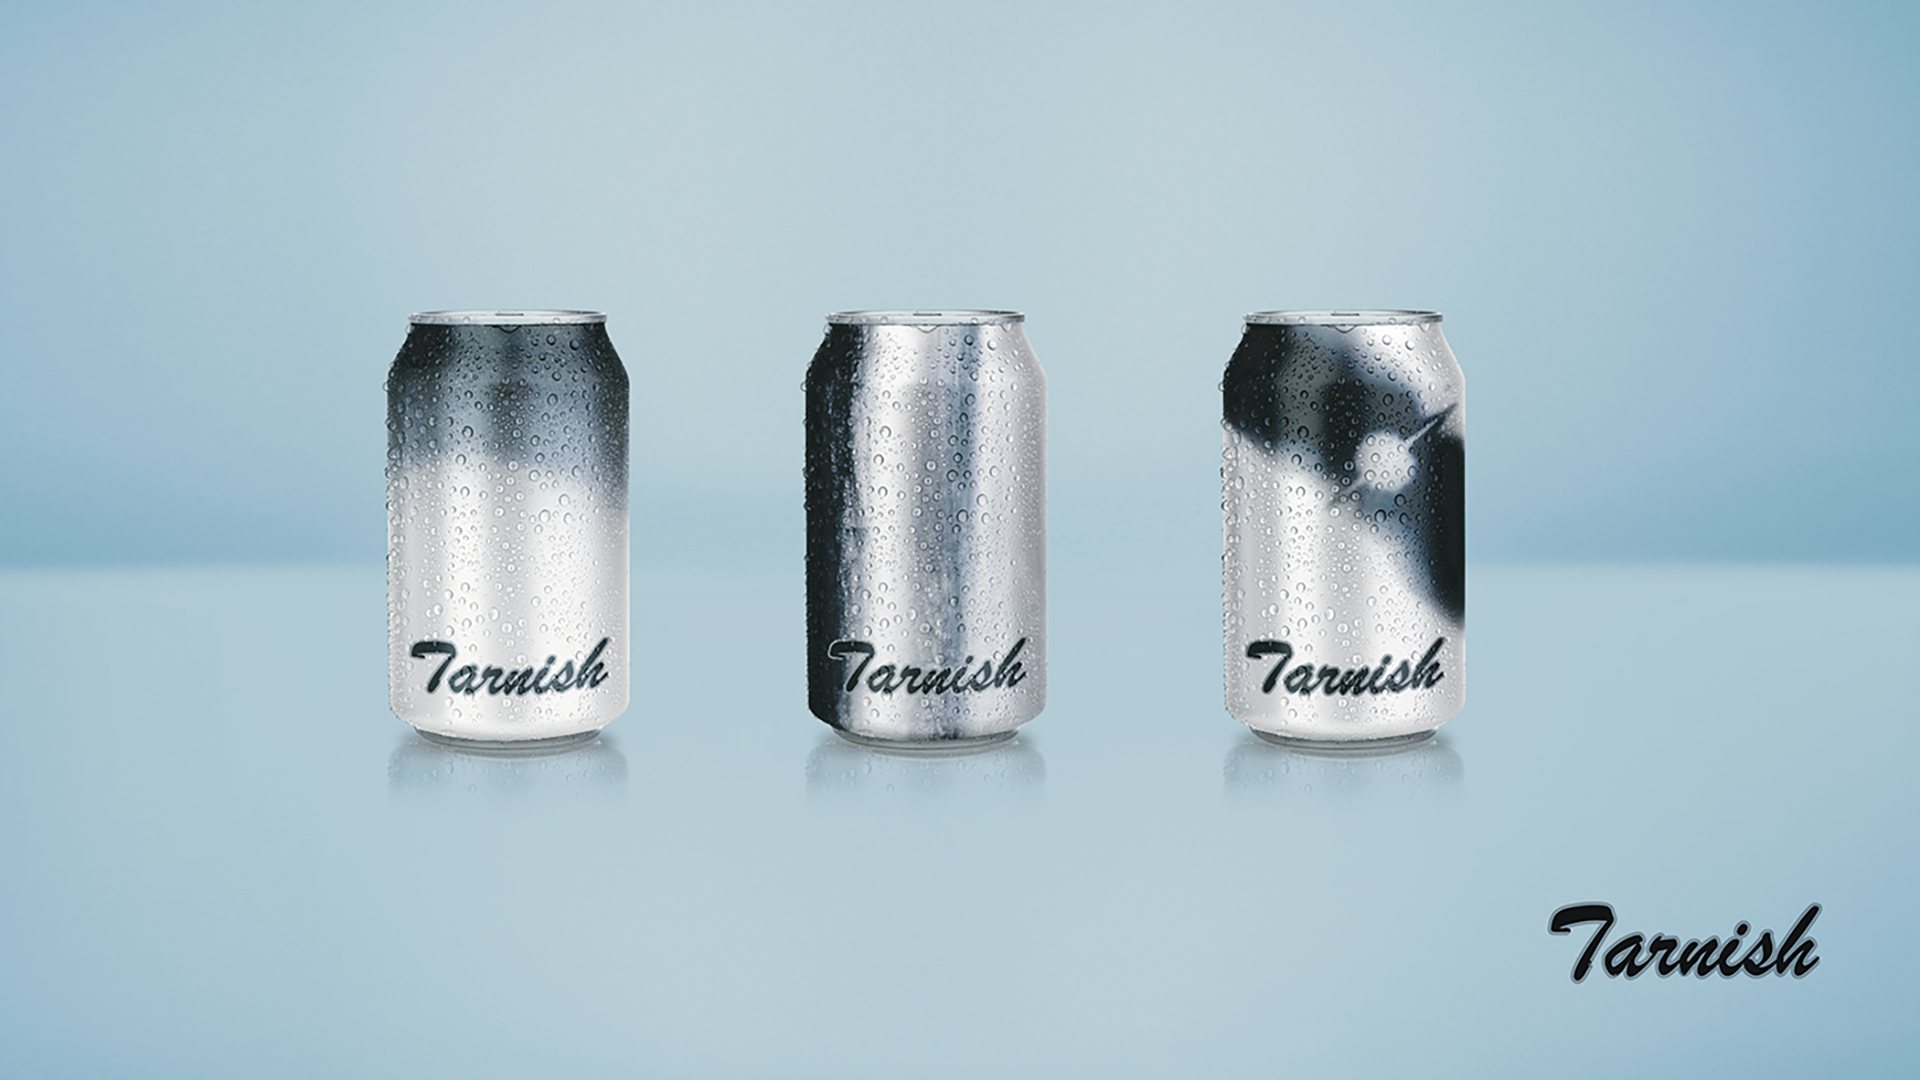 Tarnish冰啤三款包装设计